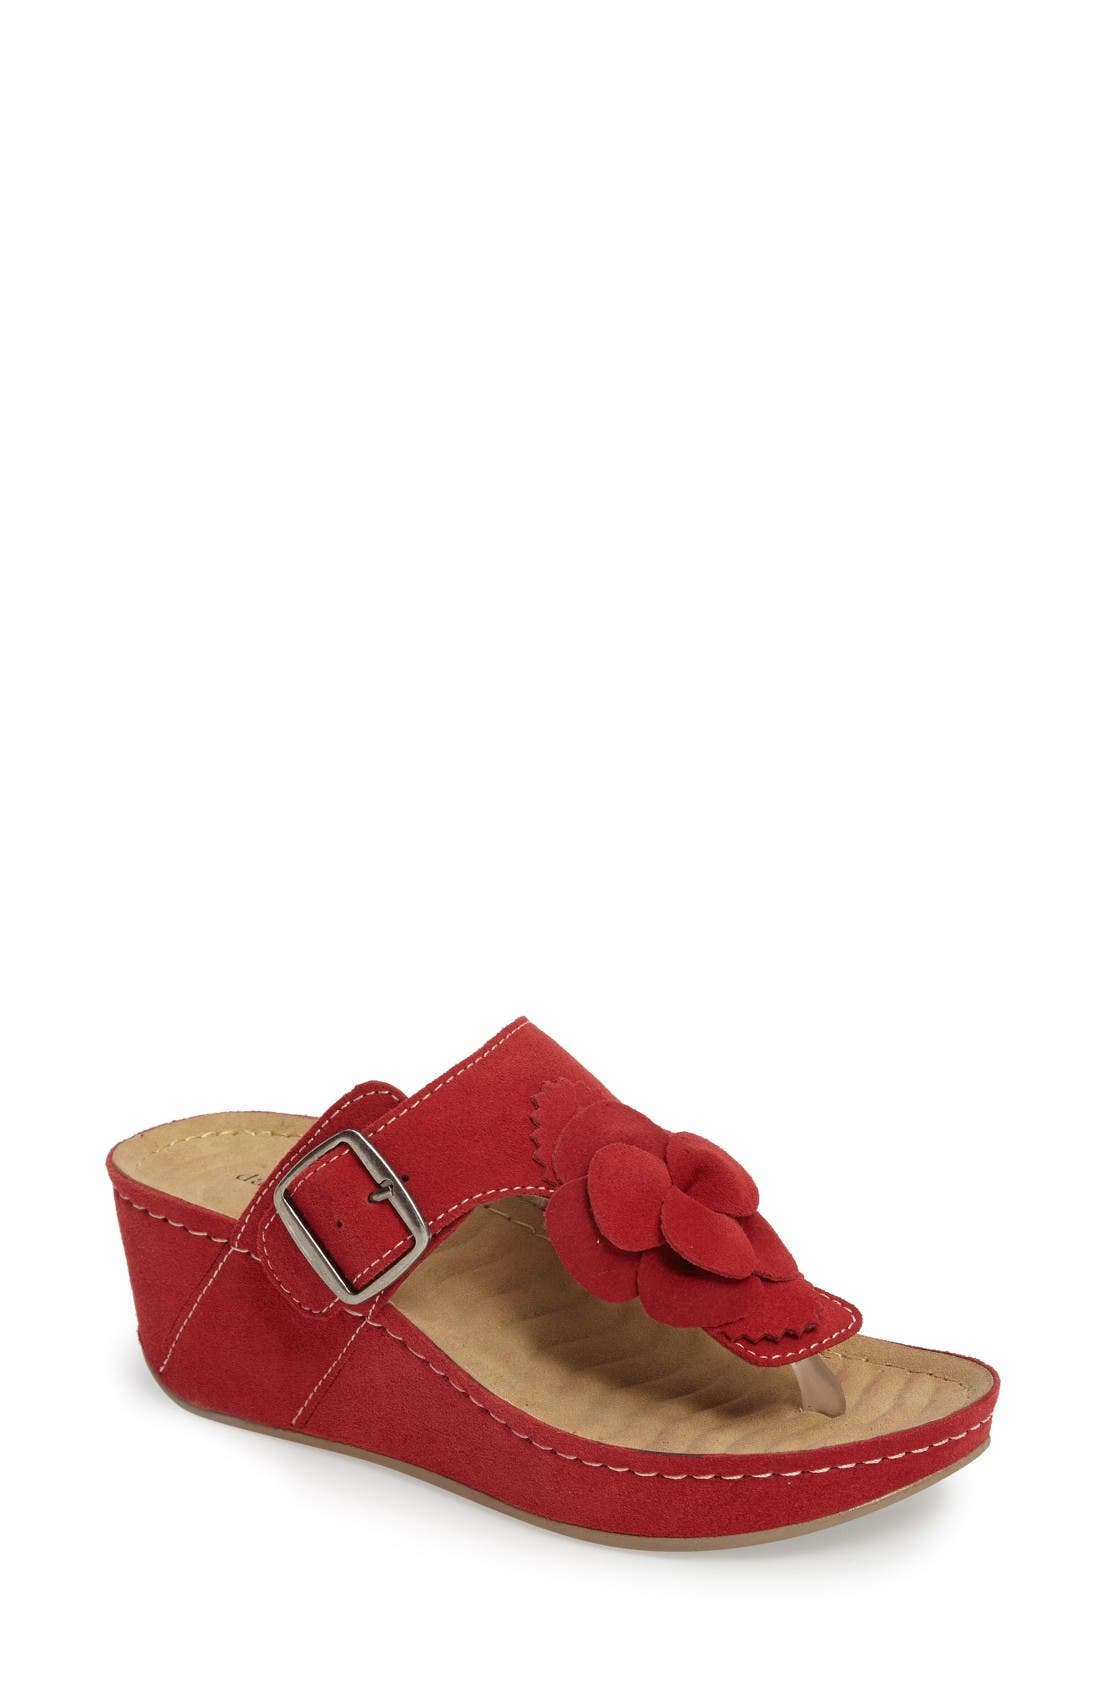 Spring Platform Wedge Sandal,                             Main thumbnail 1, color,                             Red Suede